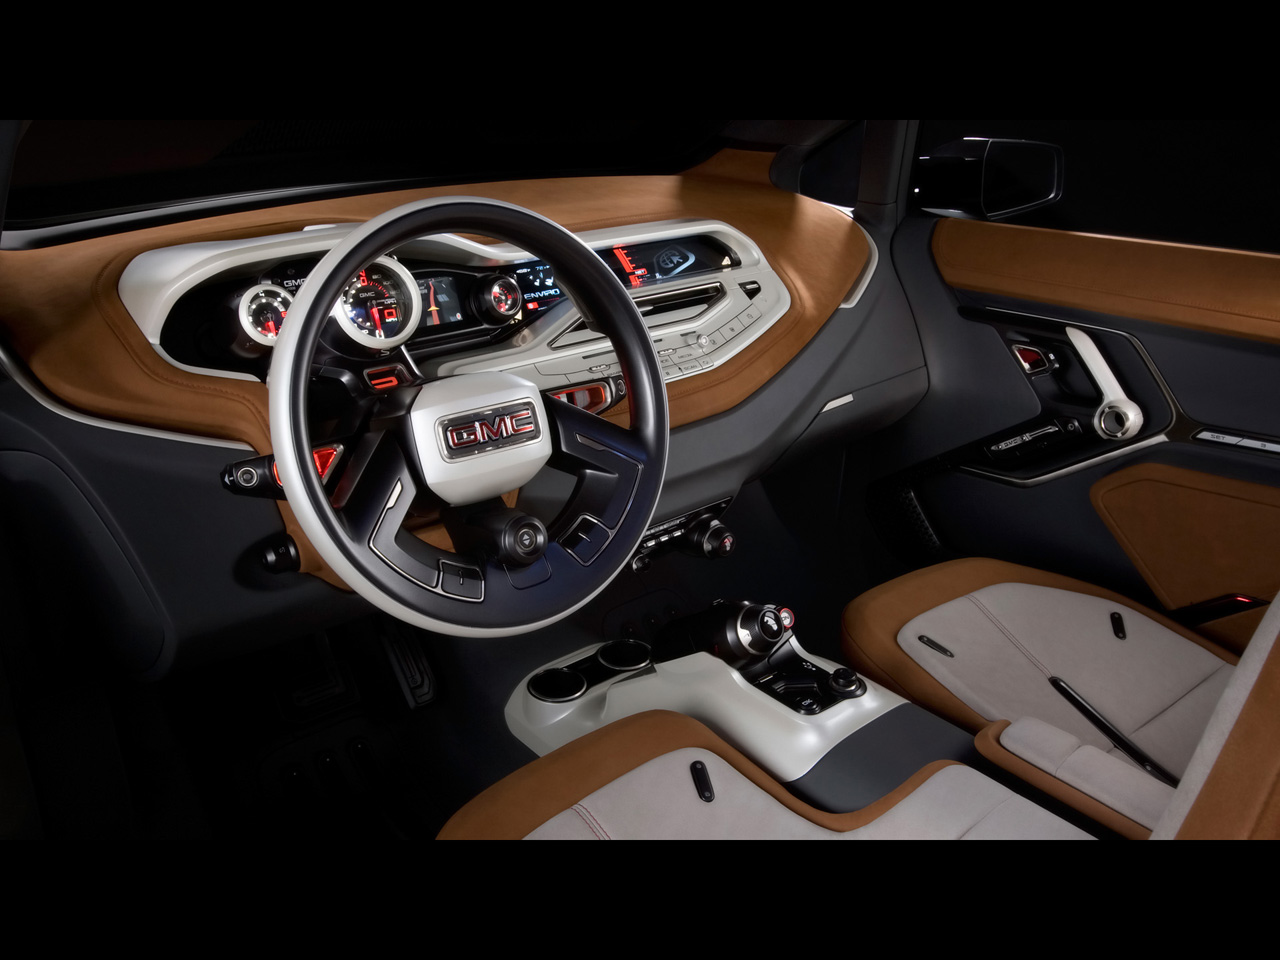 The Best Of Automotive 2010 Gmc Granite Concept